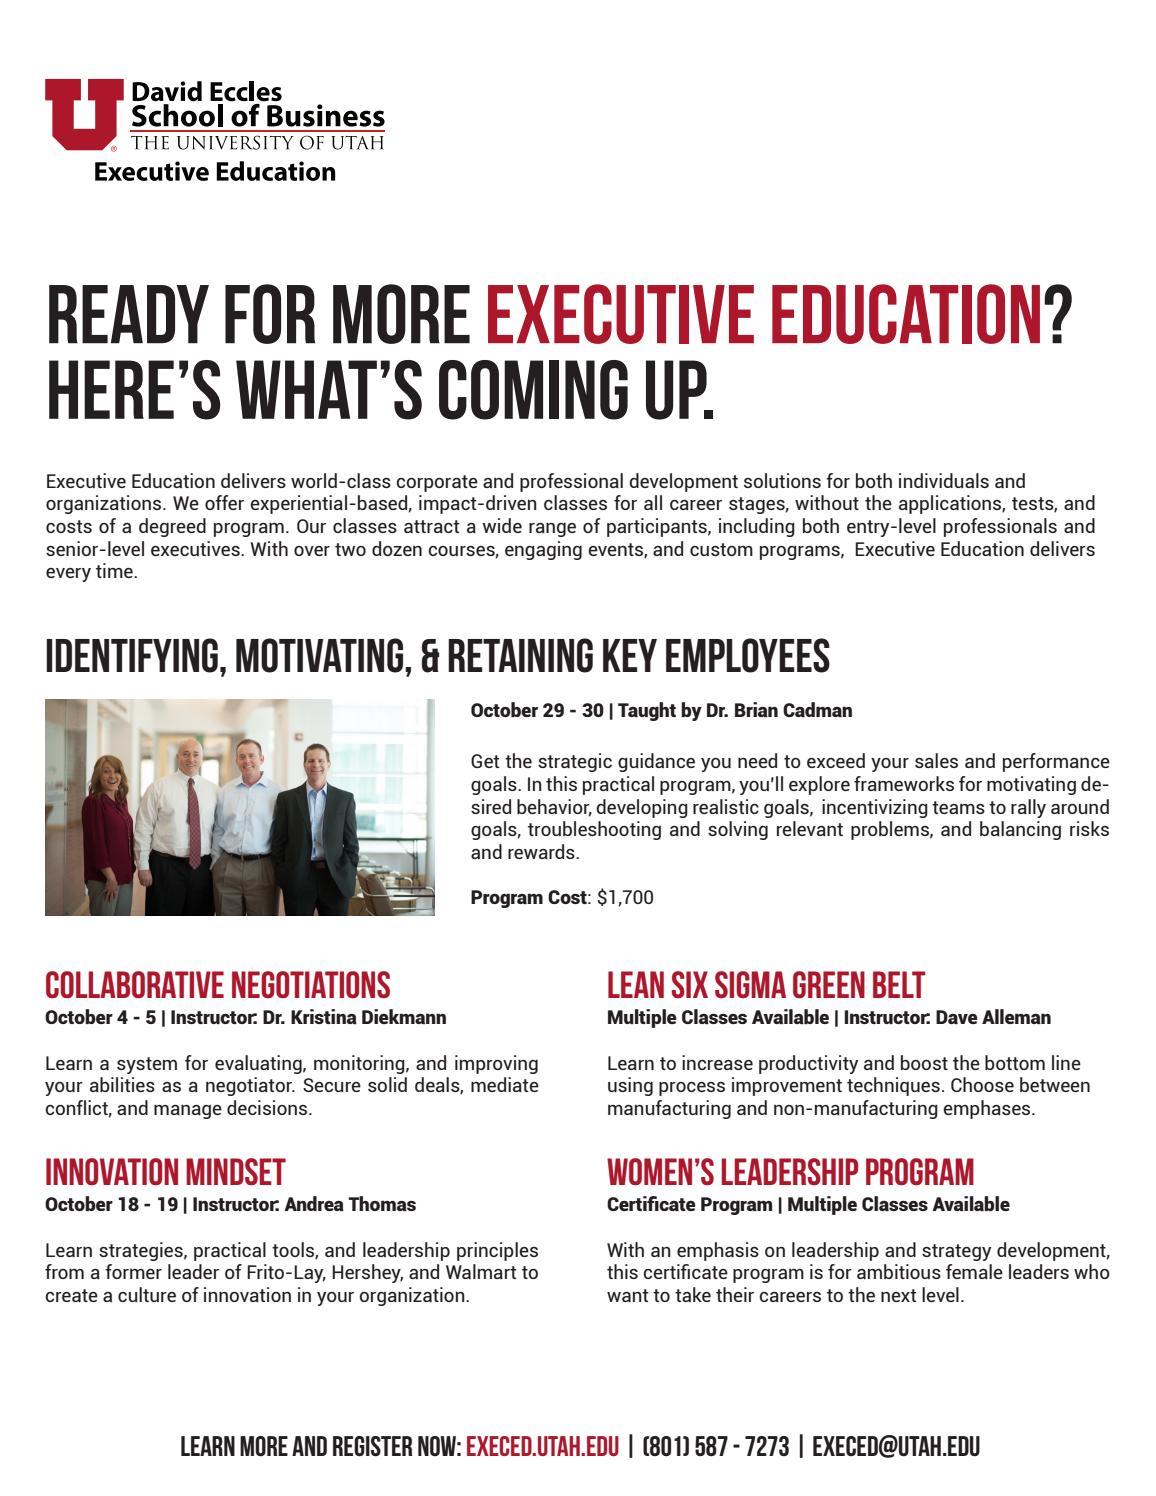 Executive Education Upcoming Classes By University Of Utahs Mba